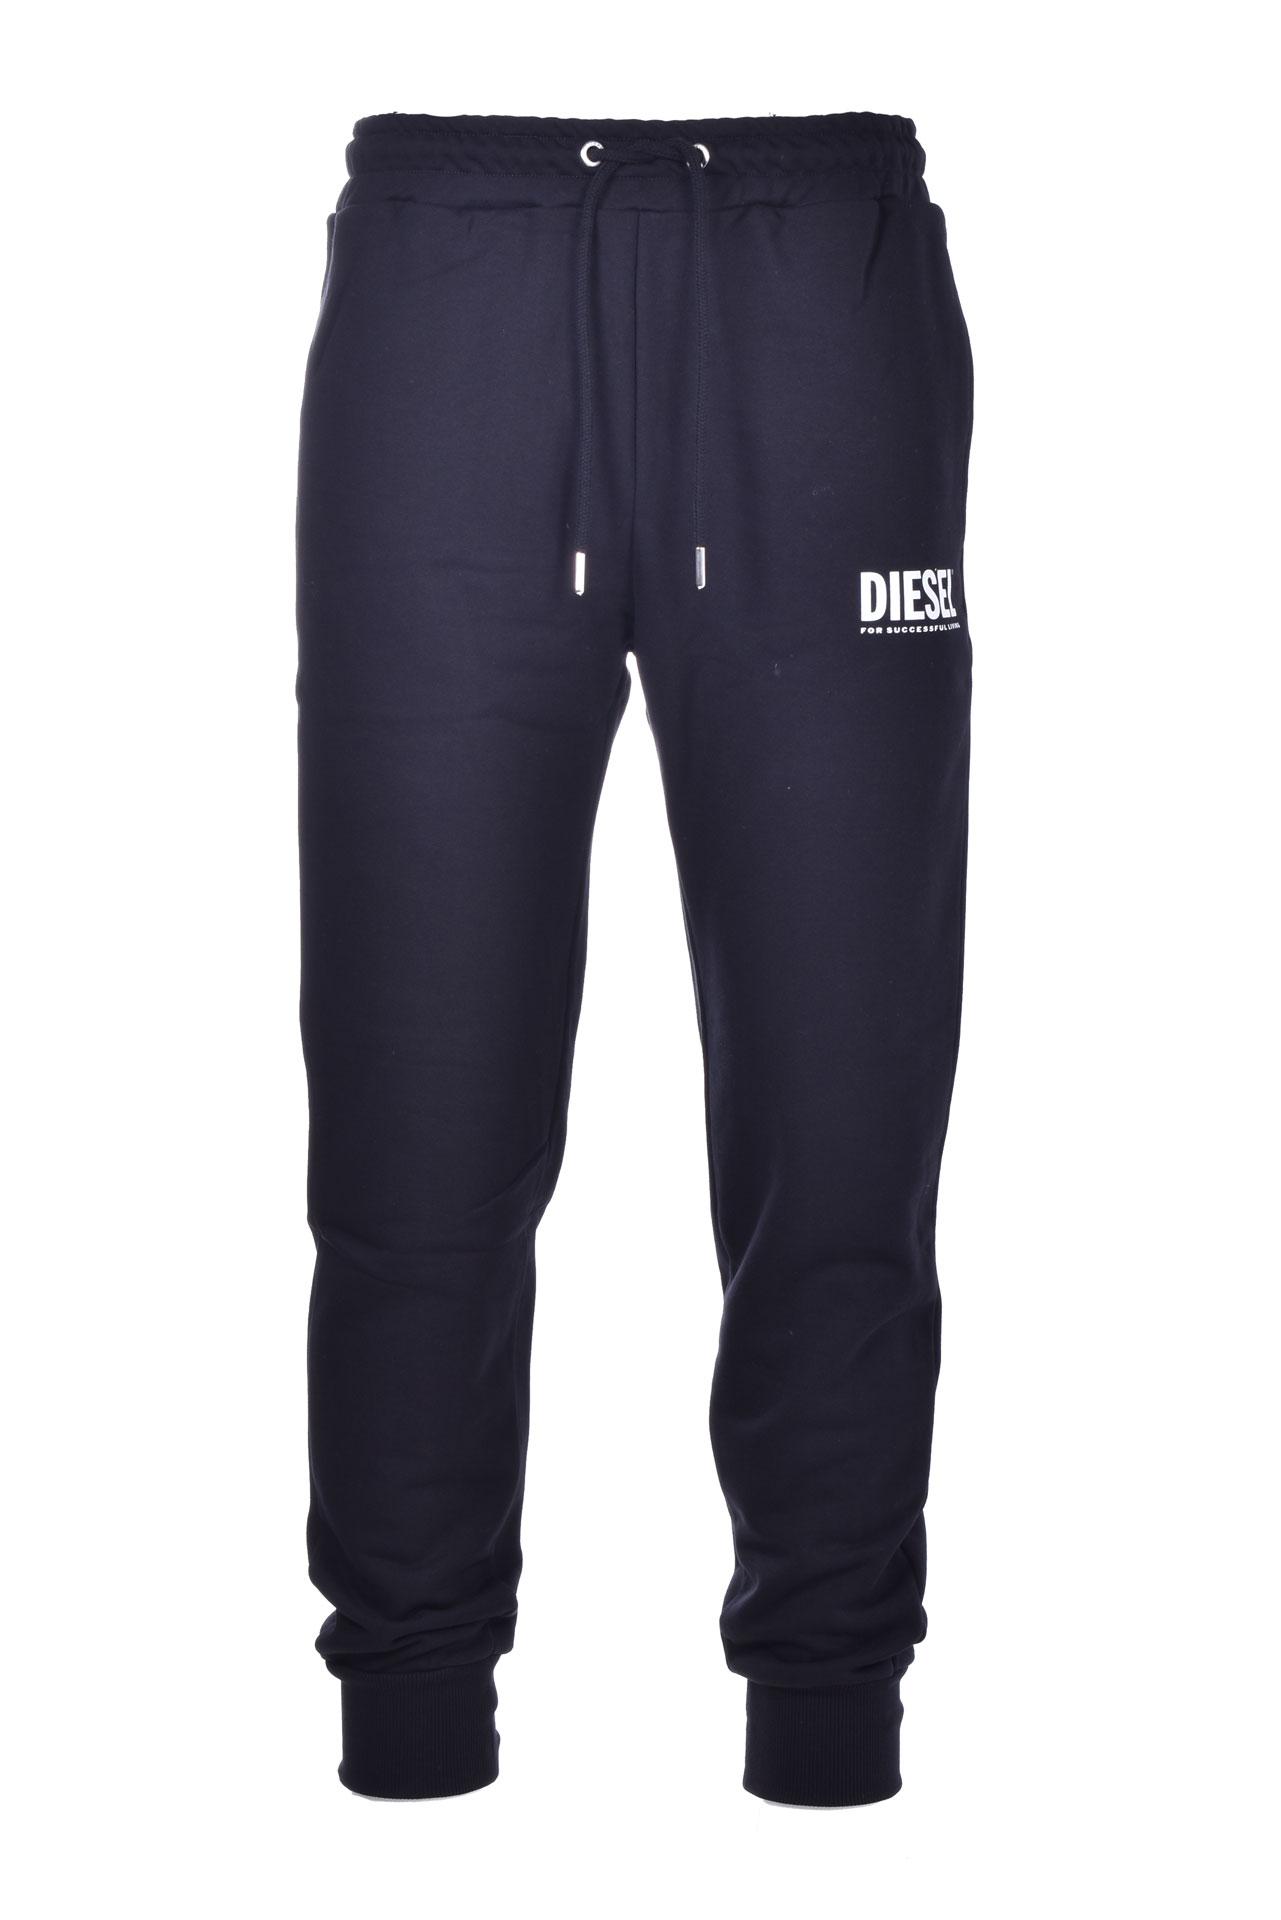 Sweatpants with Diesel logo DIESEL | Pantaloni | 00SZLB 0BAWT900